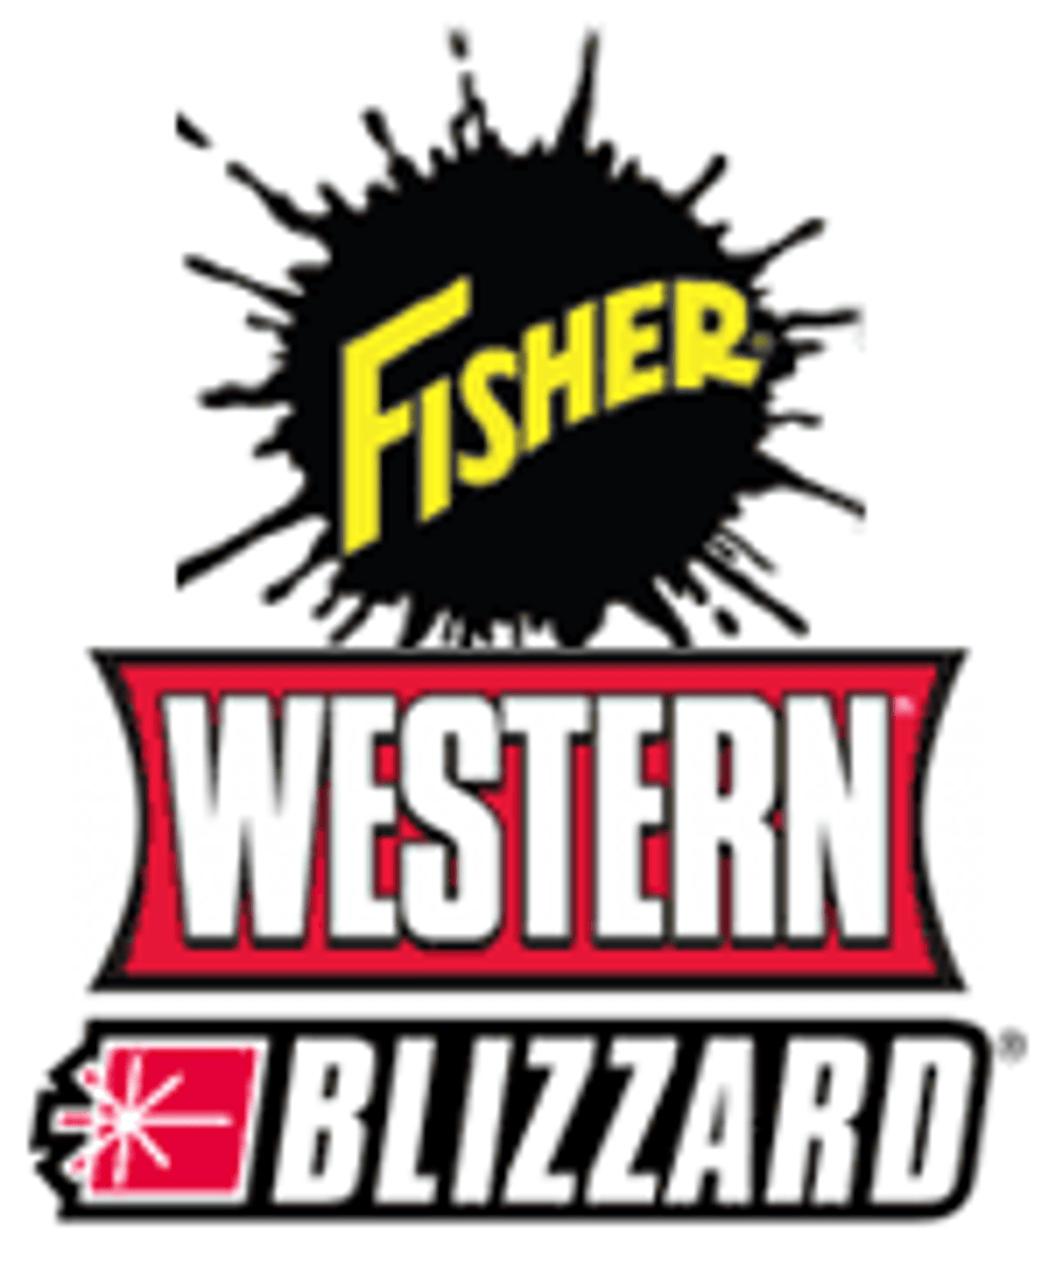 28213K - FISHER - WESTERN - BLIZZARD - SNOWEX  HARNESS KIT PLOW LIGHTING H13